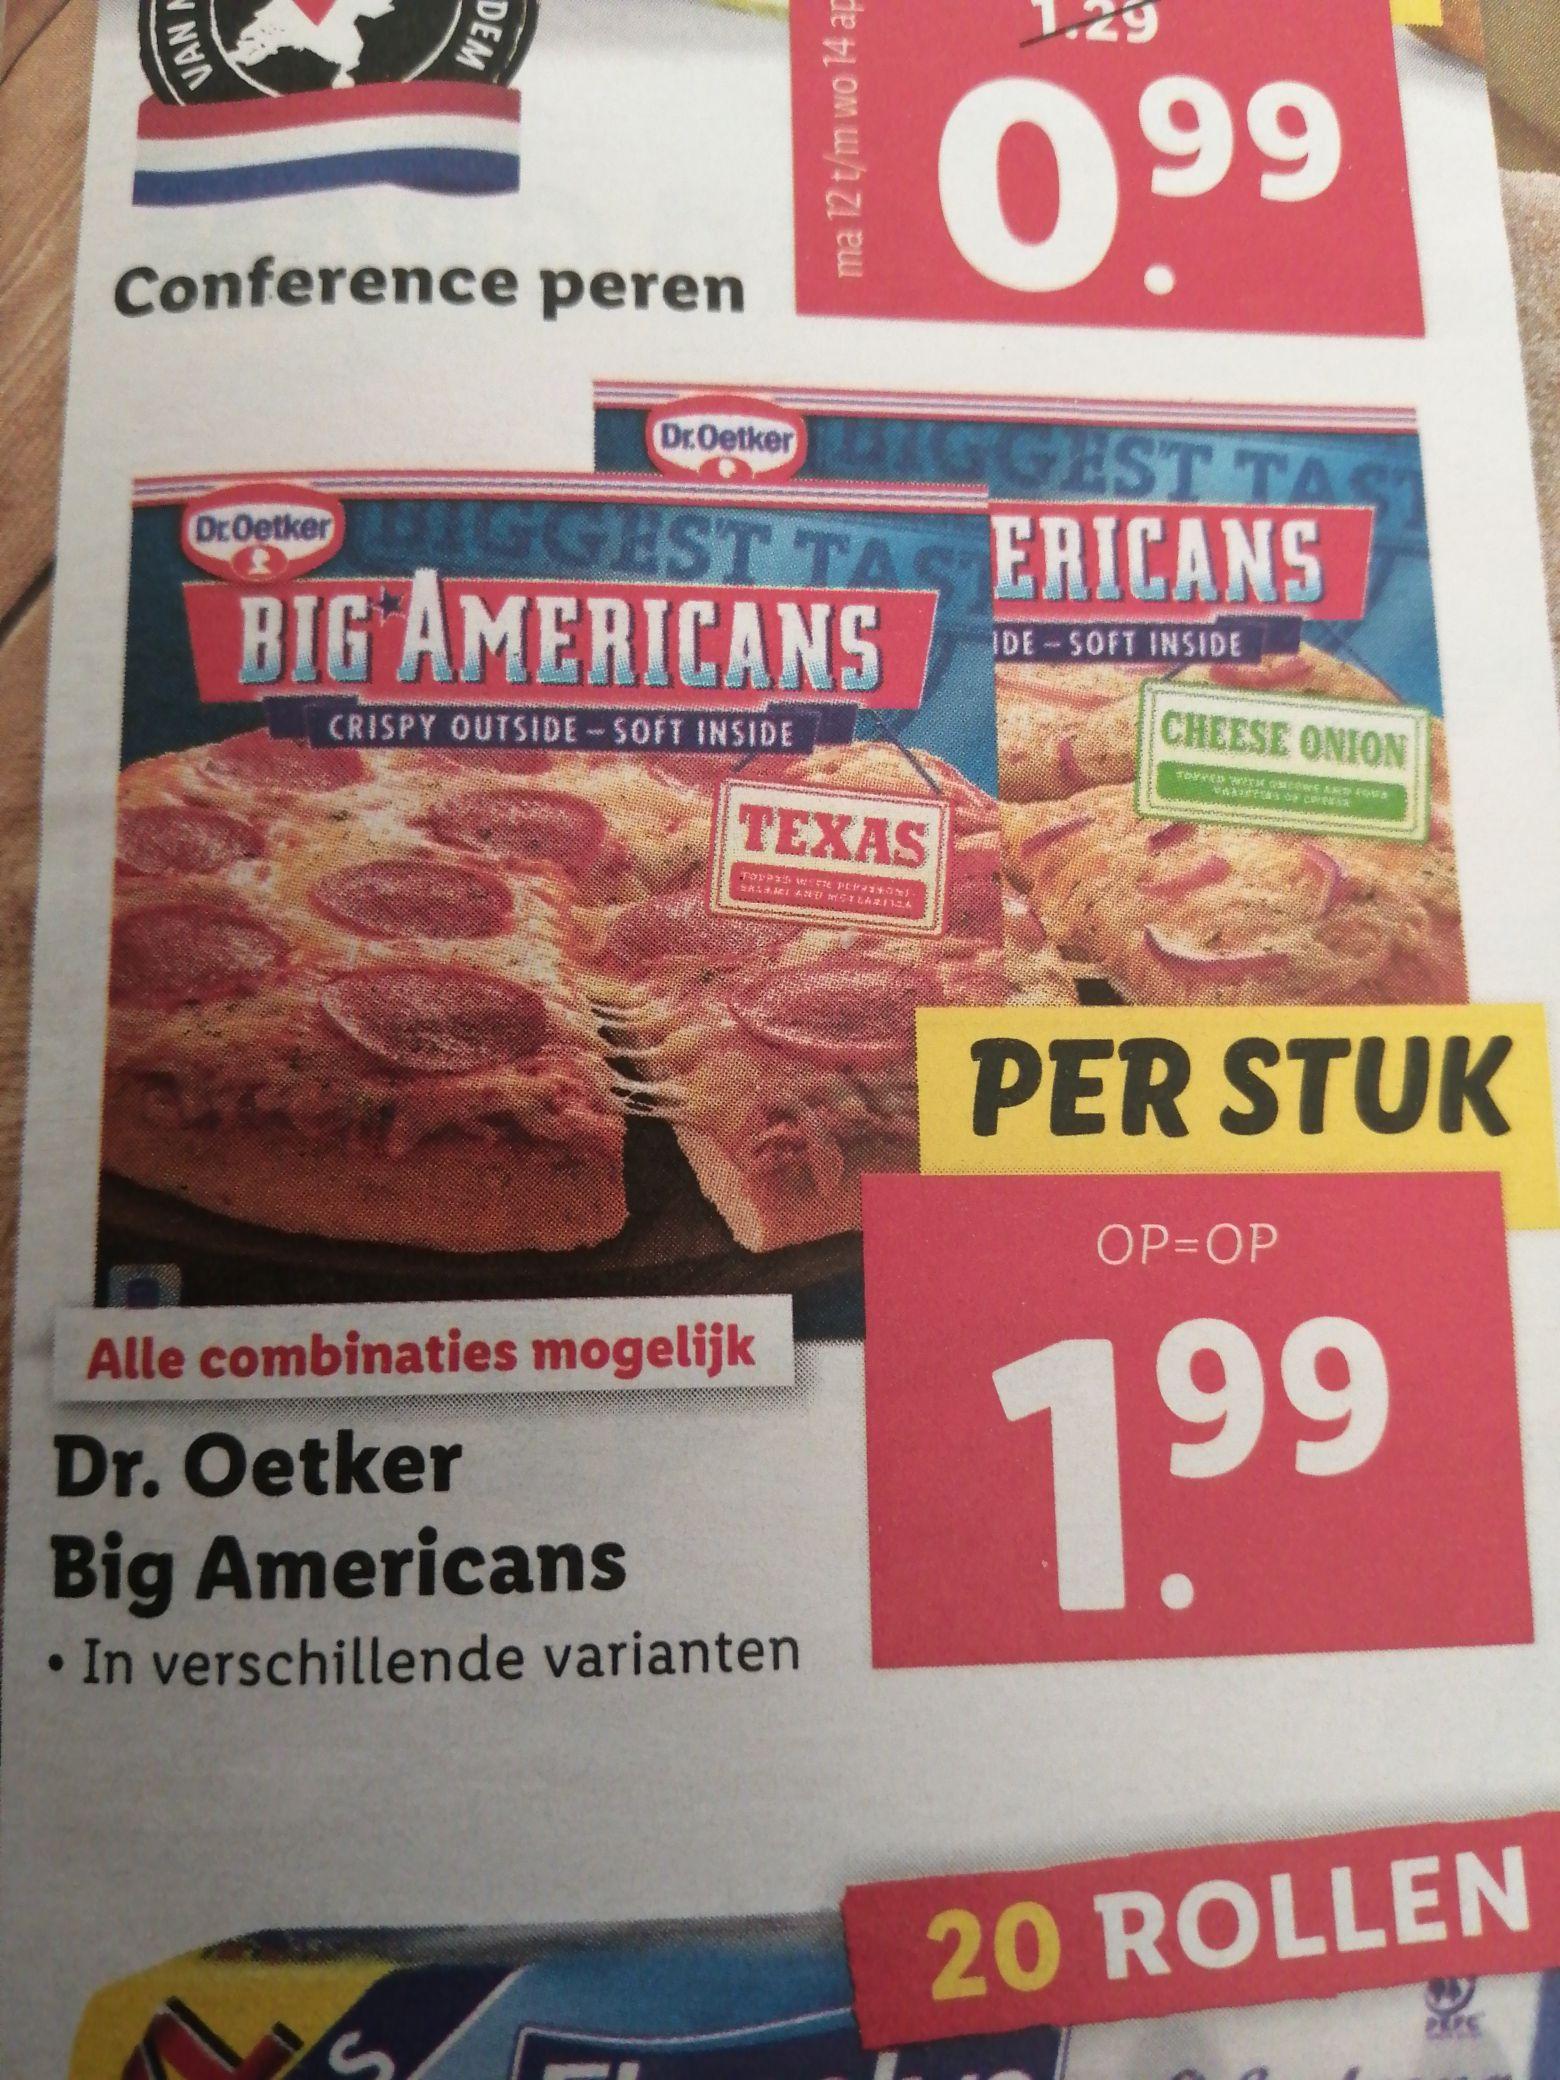 Big American pizza